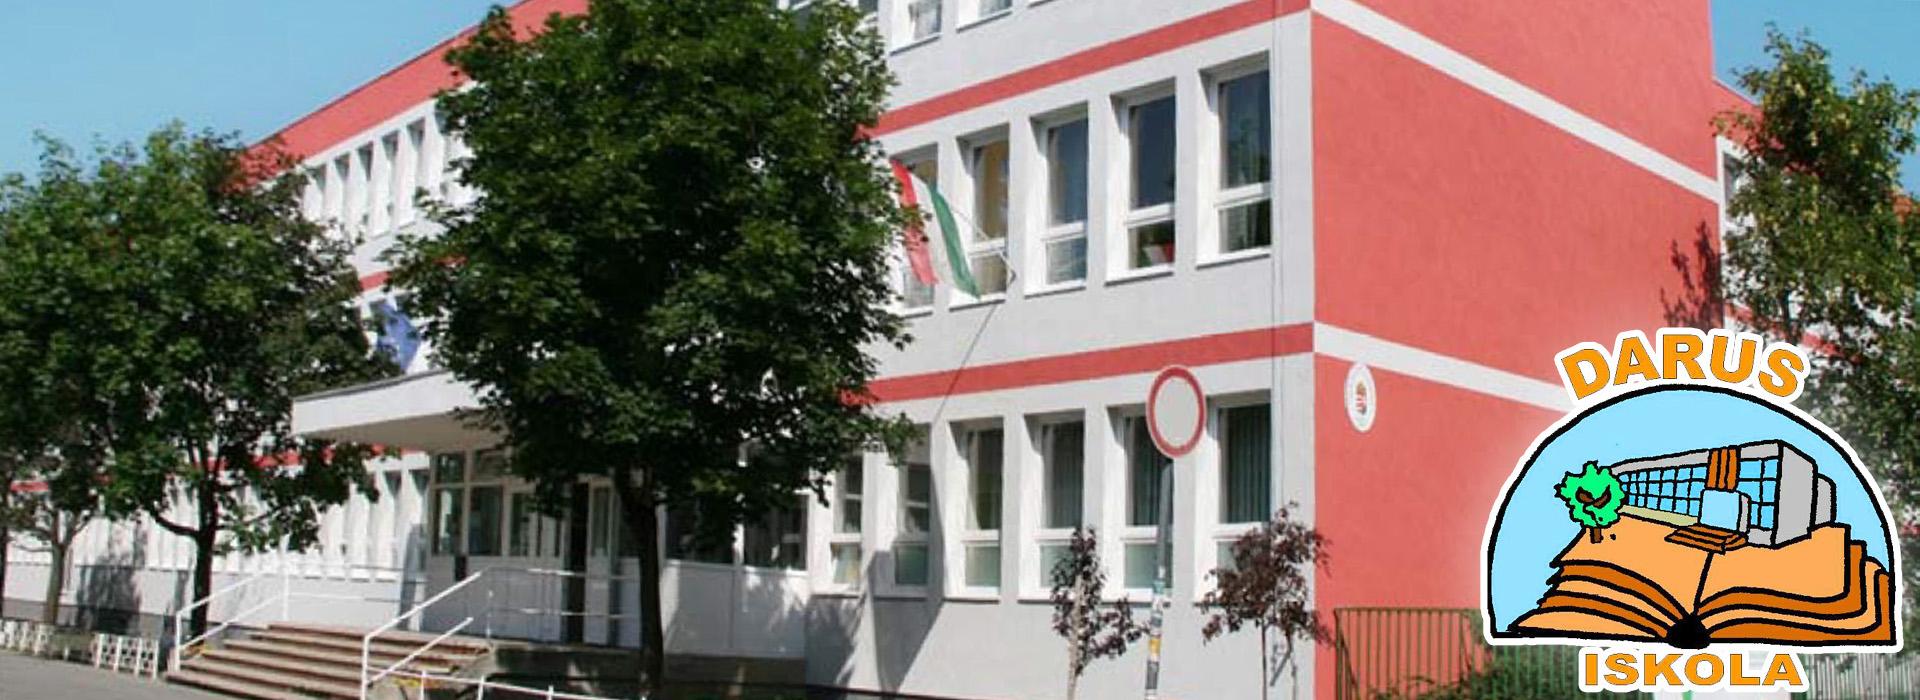 hatter-iskola2-logó3